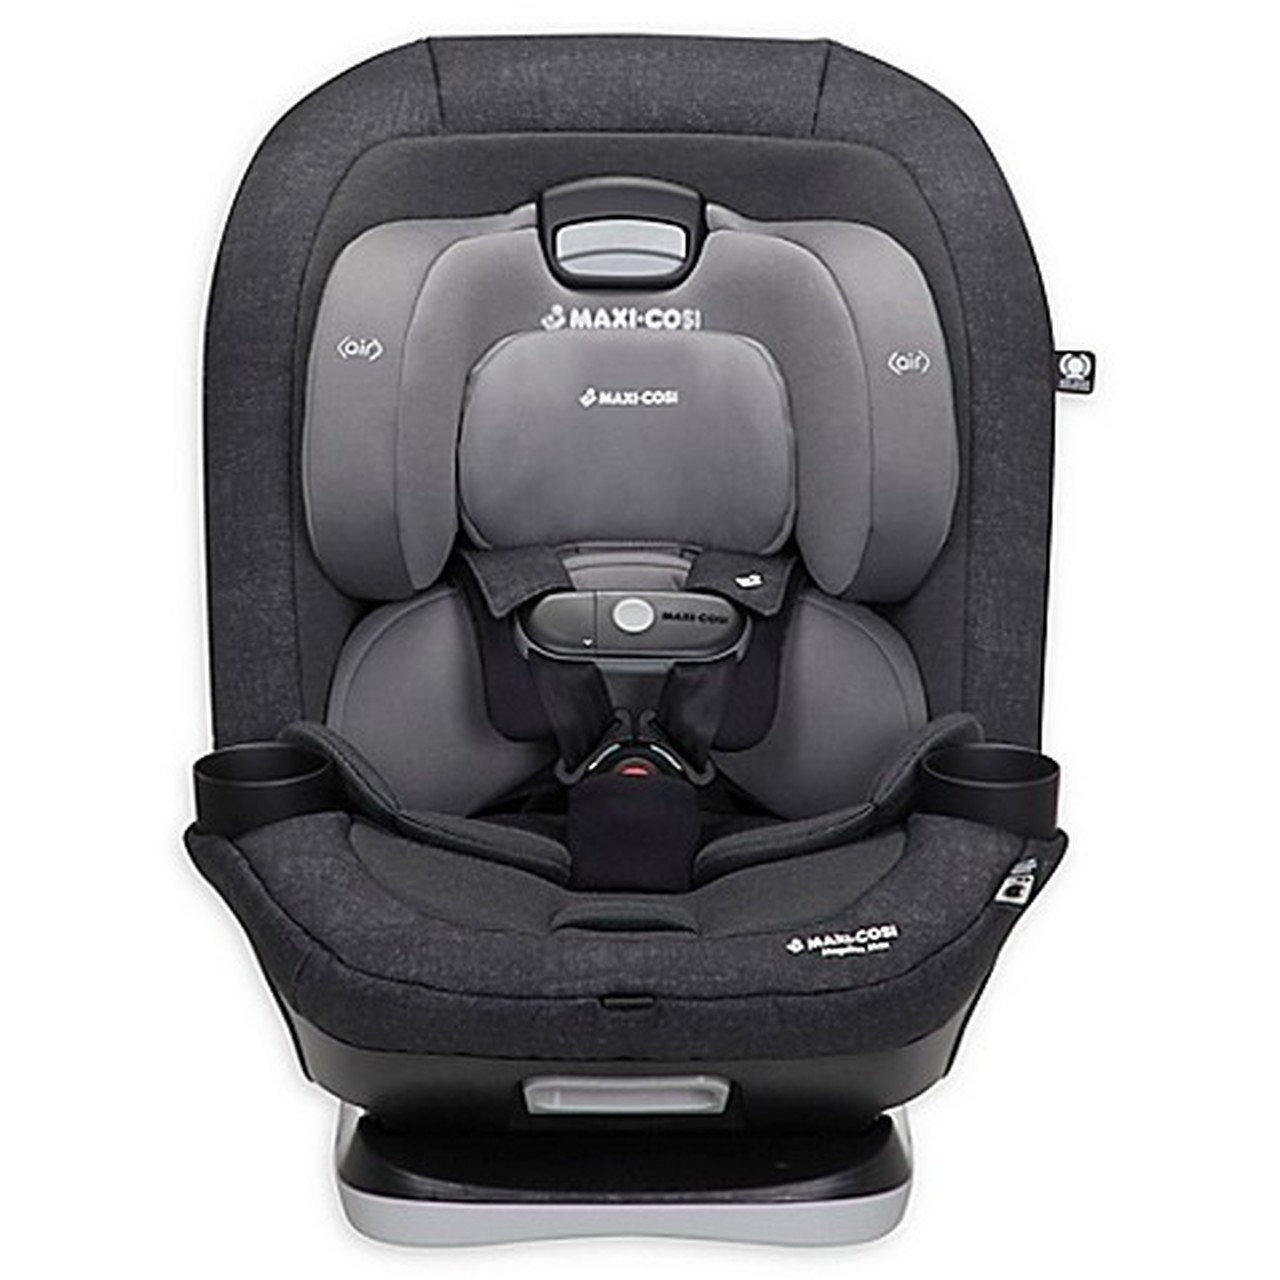 Maxi-Cosi® Magellan™ Max 5-in-1 Convertible Car Seat in Nomad Black